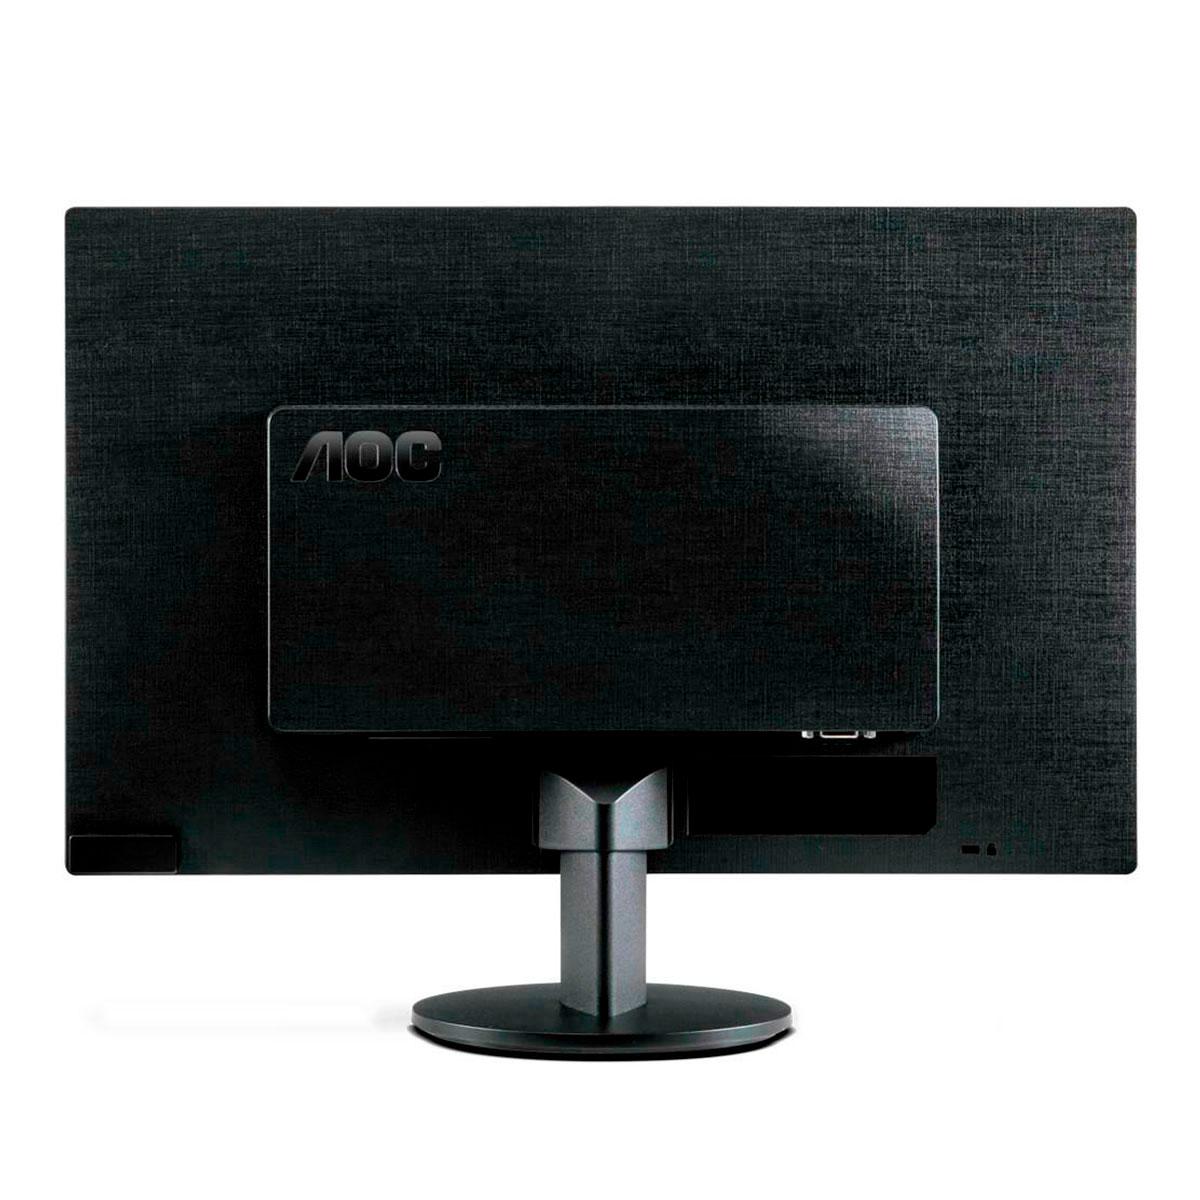 "Monitor AOC E970SWHNL 18,5"" LED HD, Widescreen, 60Hz, VGA e HDMI"